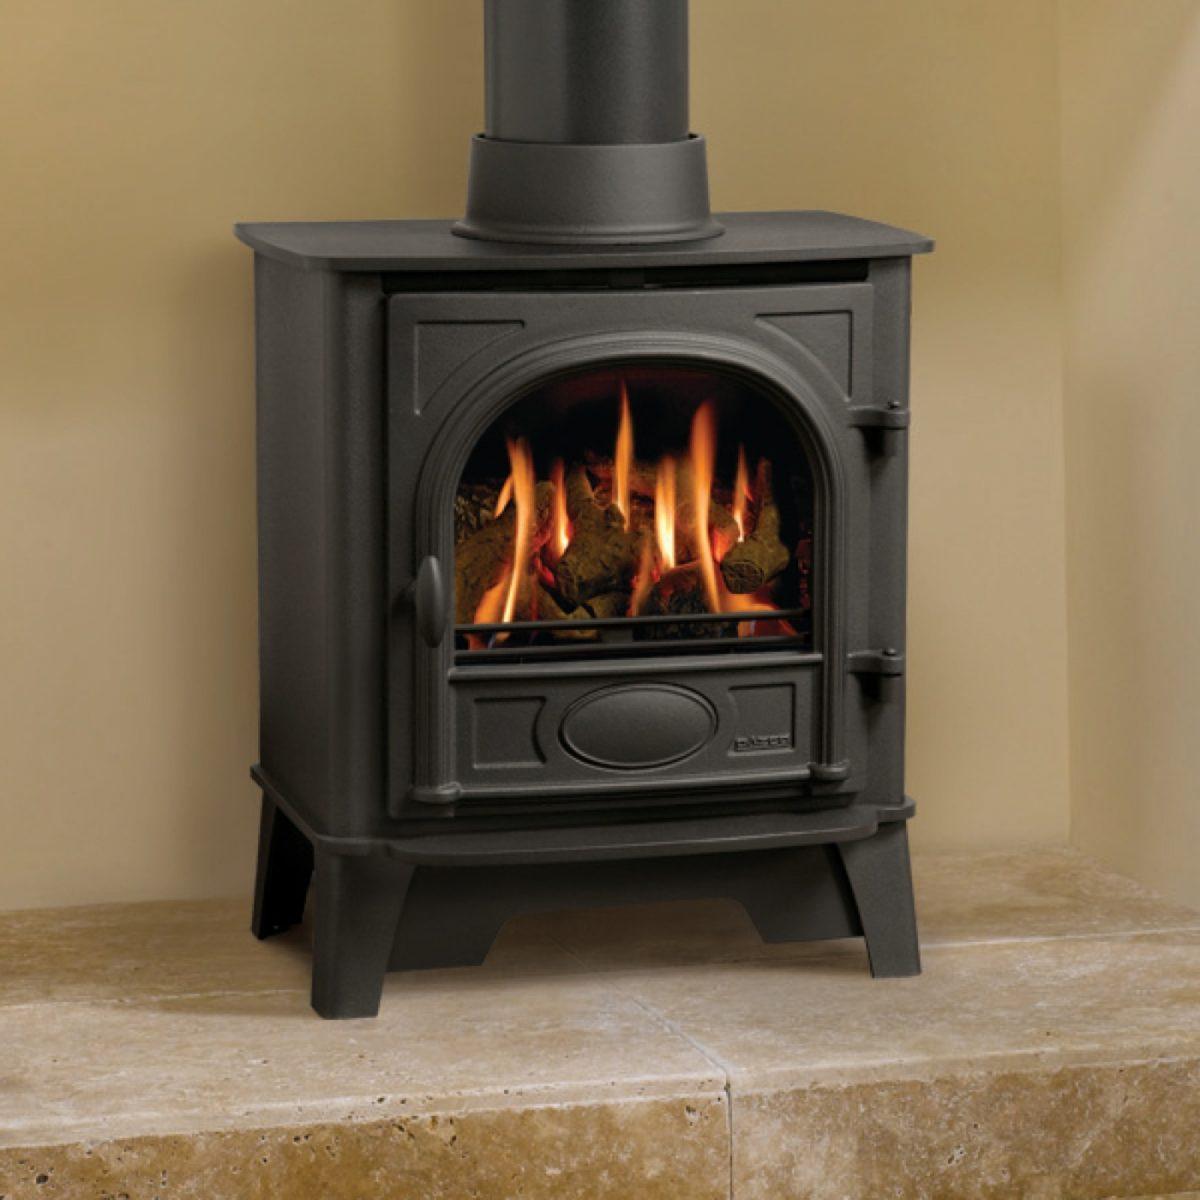 Gazco Stockton 5 Log Effect Natural Gas Balanced Flue